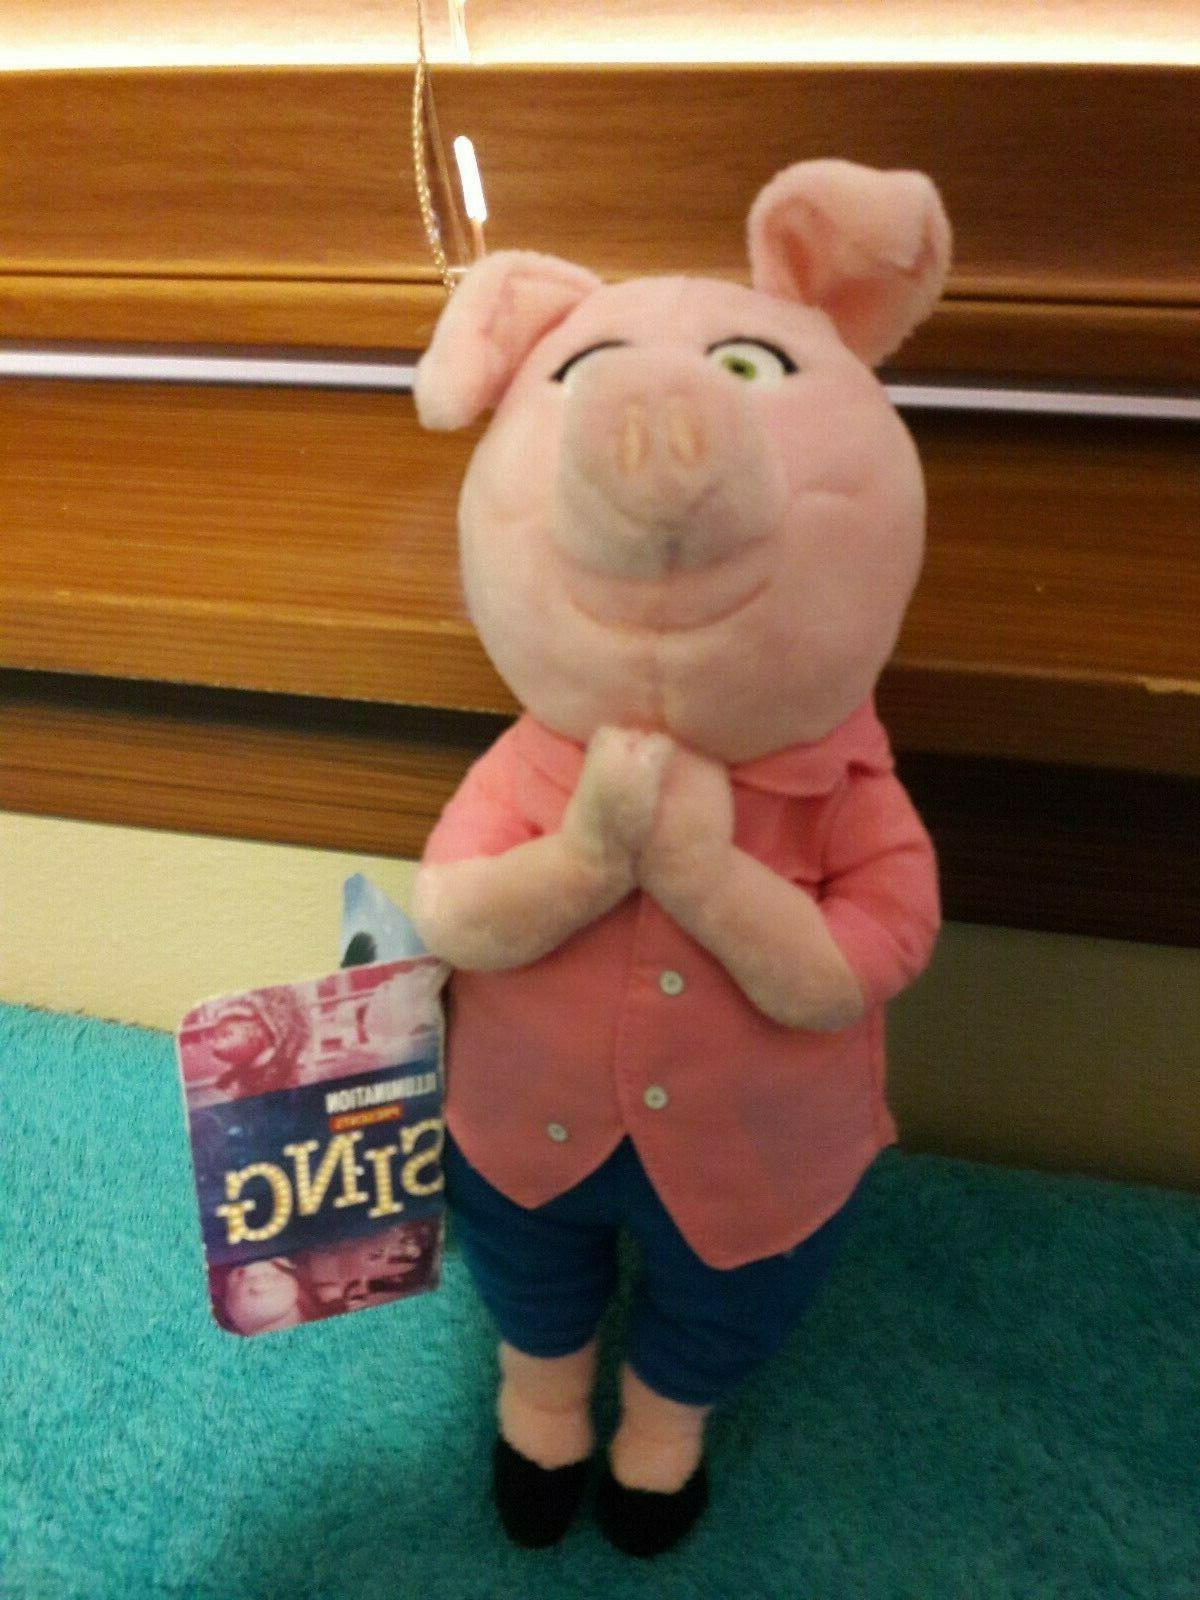 sing rosita pig 8 plush presents nwt